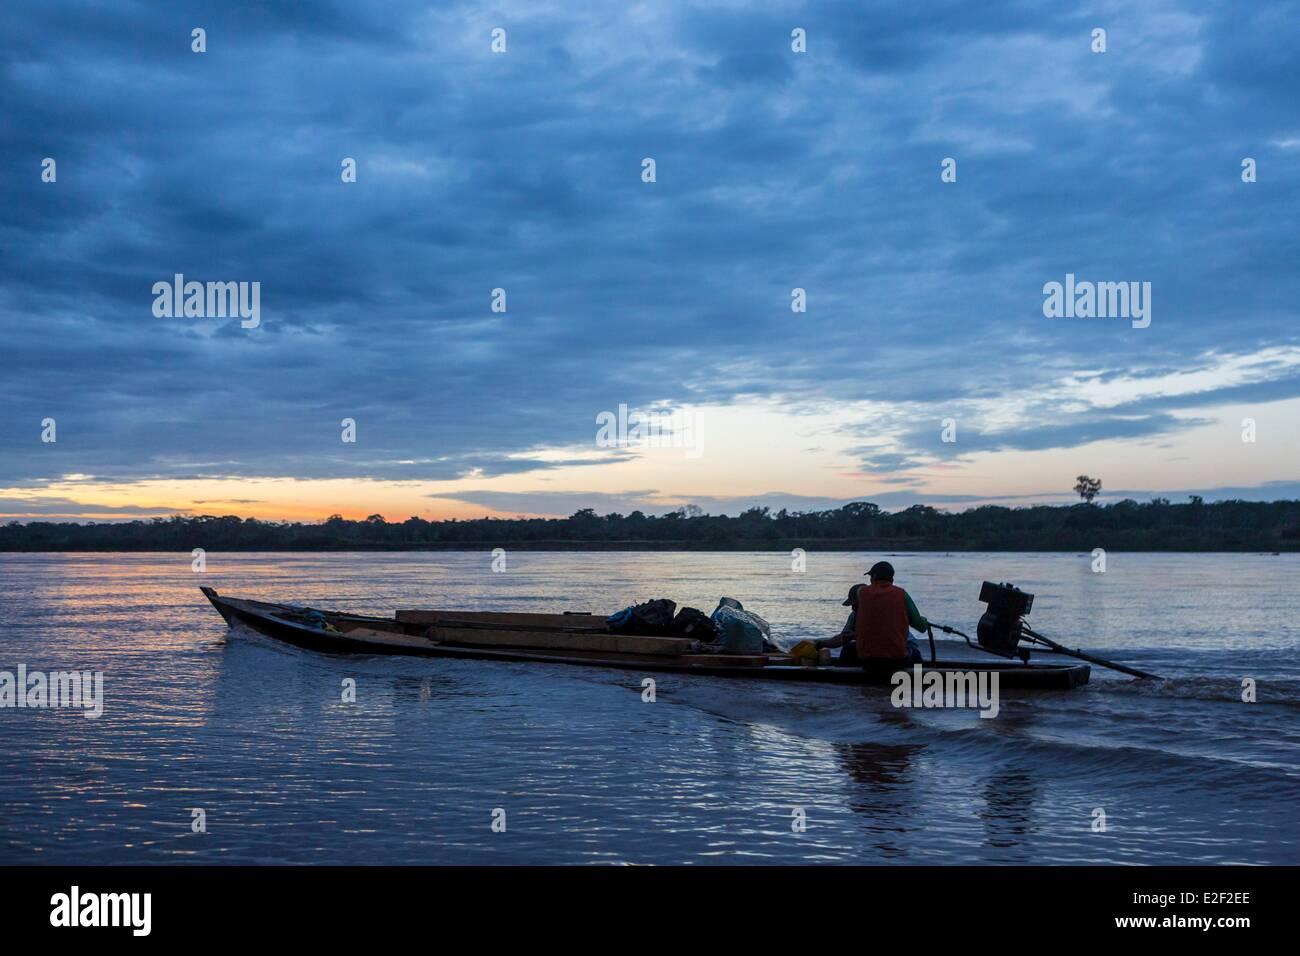 Peru, Madre de Dios, Amazon, Puerto Maldonado, canoe at sunset on the Rio Madre de Dios river - Stock Image